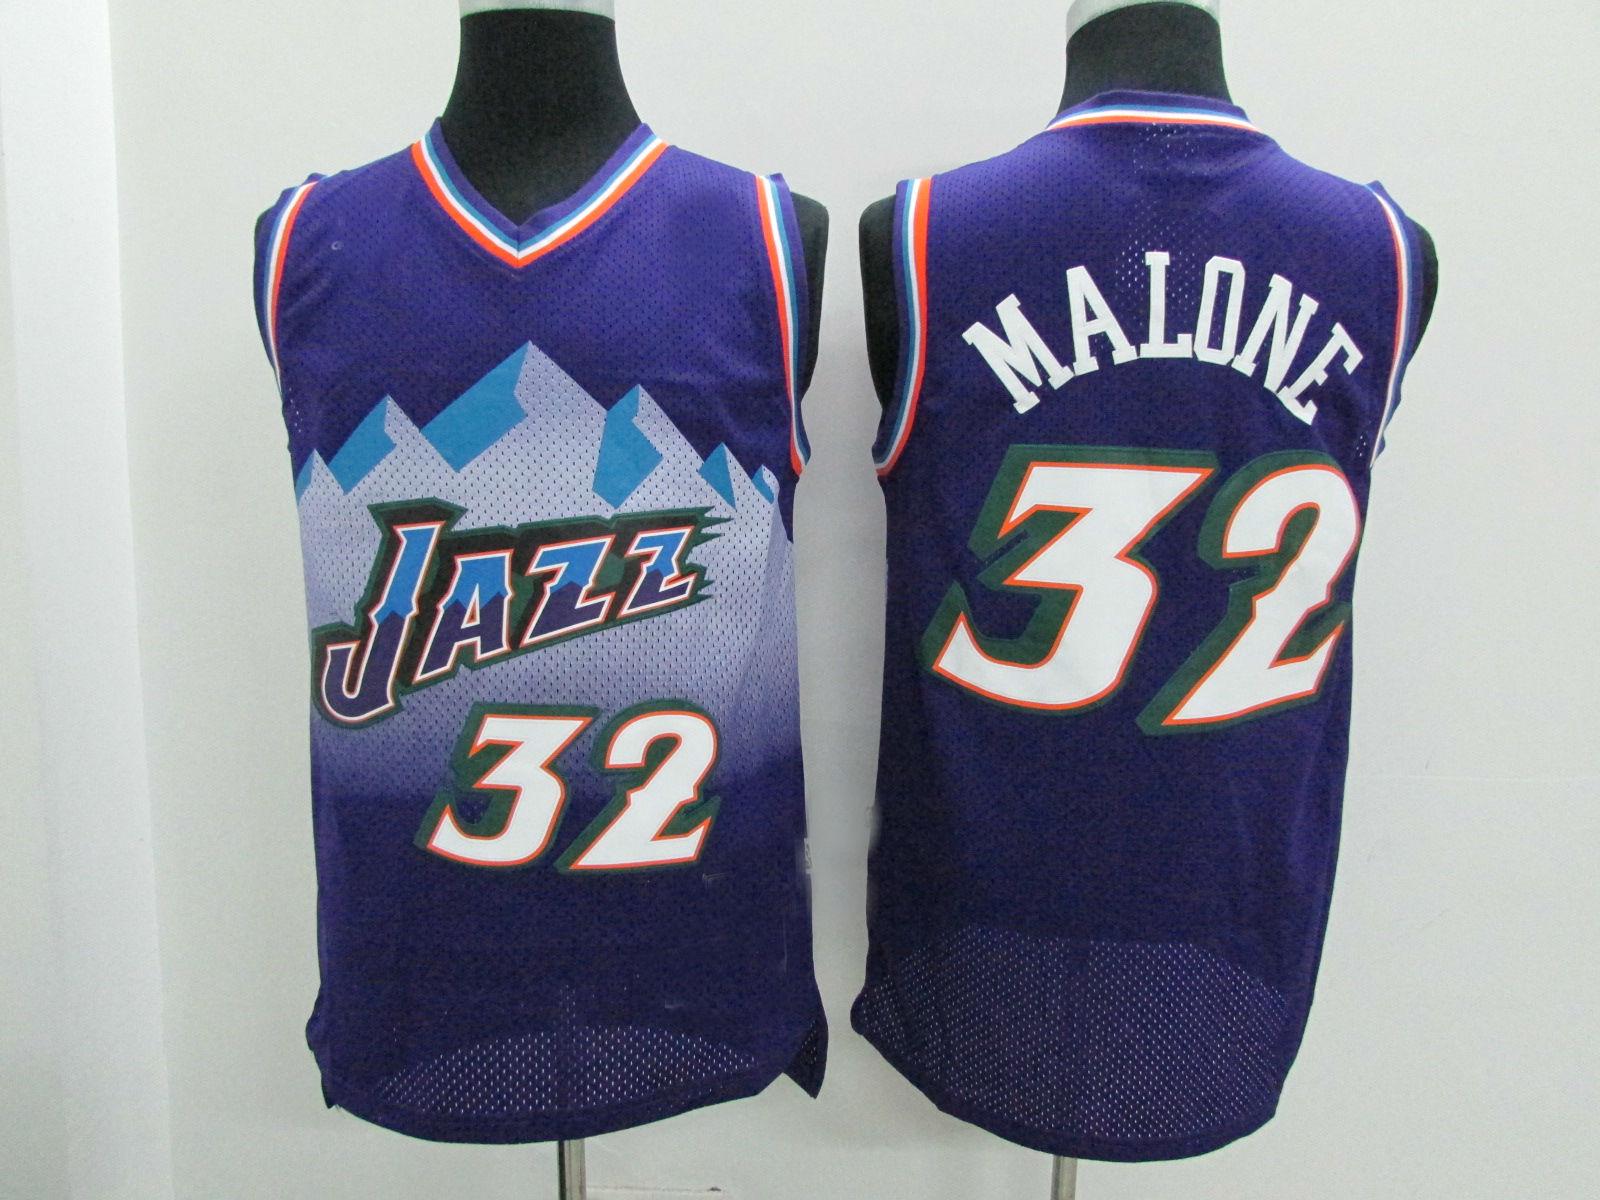 c9e781a1d Utah Jazz Retro Jerseys  32 Malone Purple Throwback Basketball Jersey